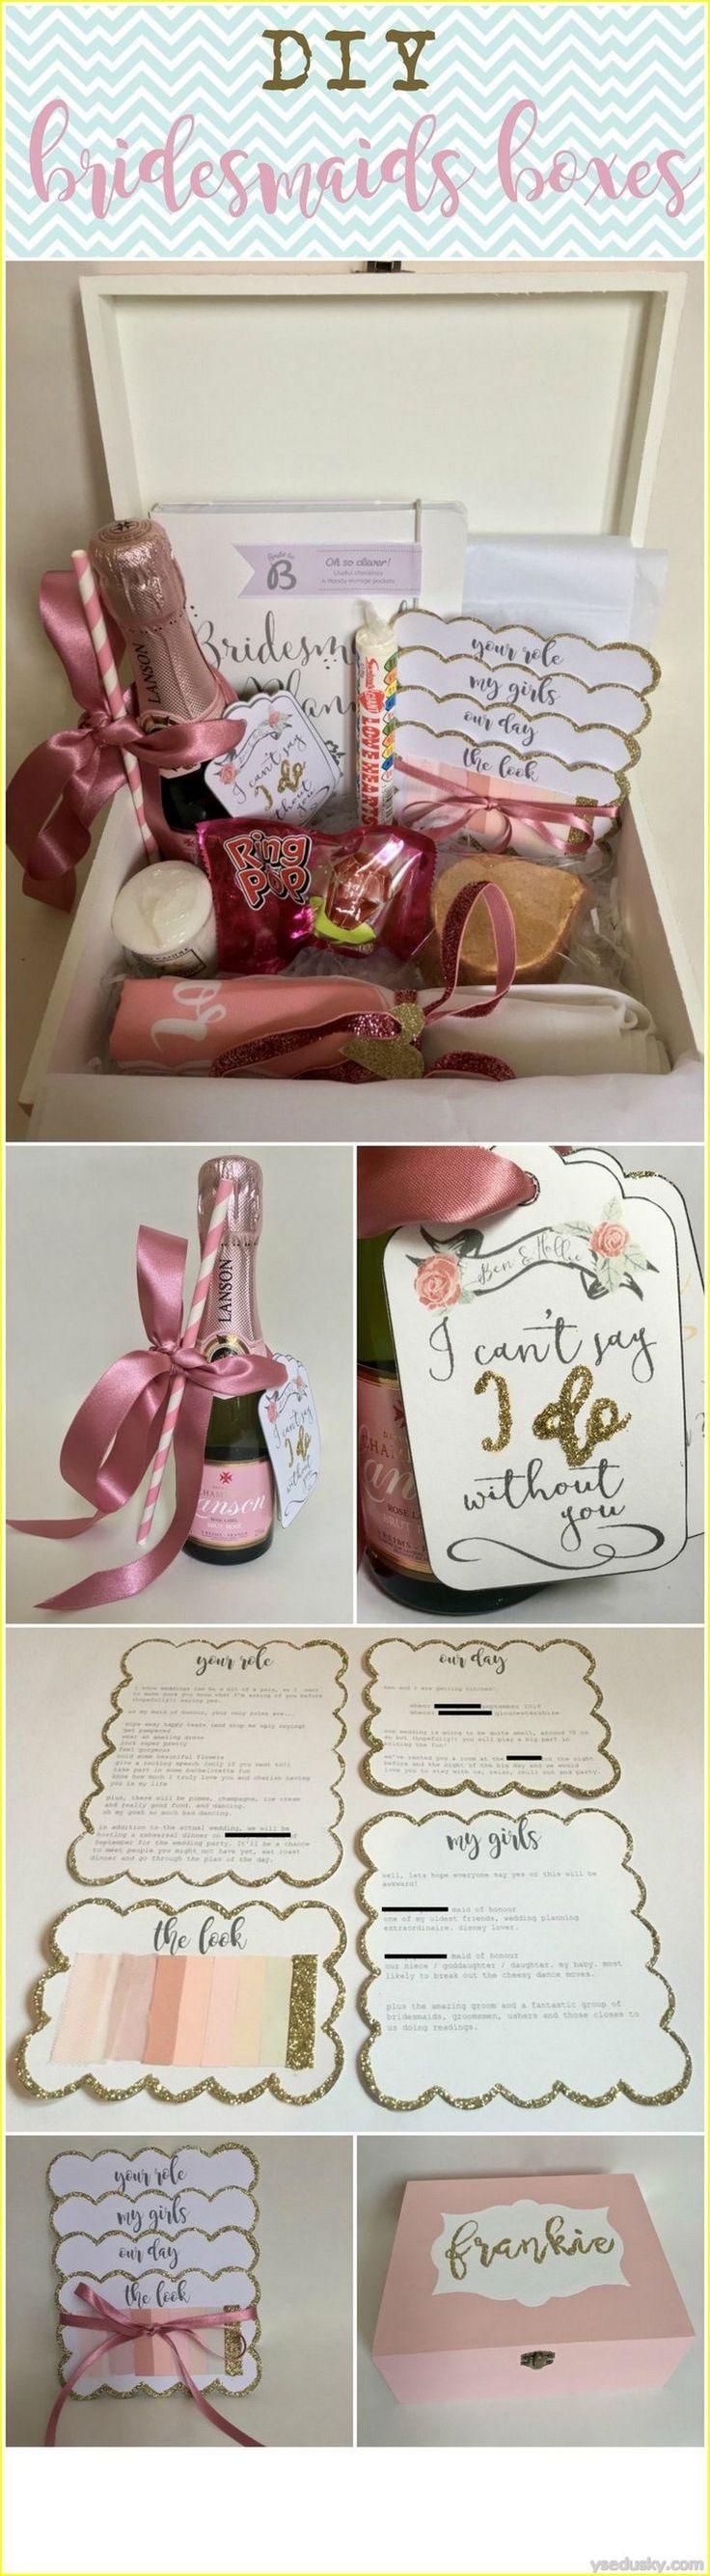 Bridesmaid Diy Bridesmaid Gift Box 2737342 Weddbook